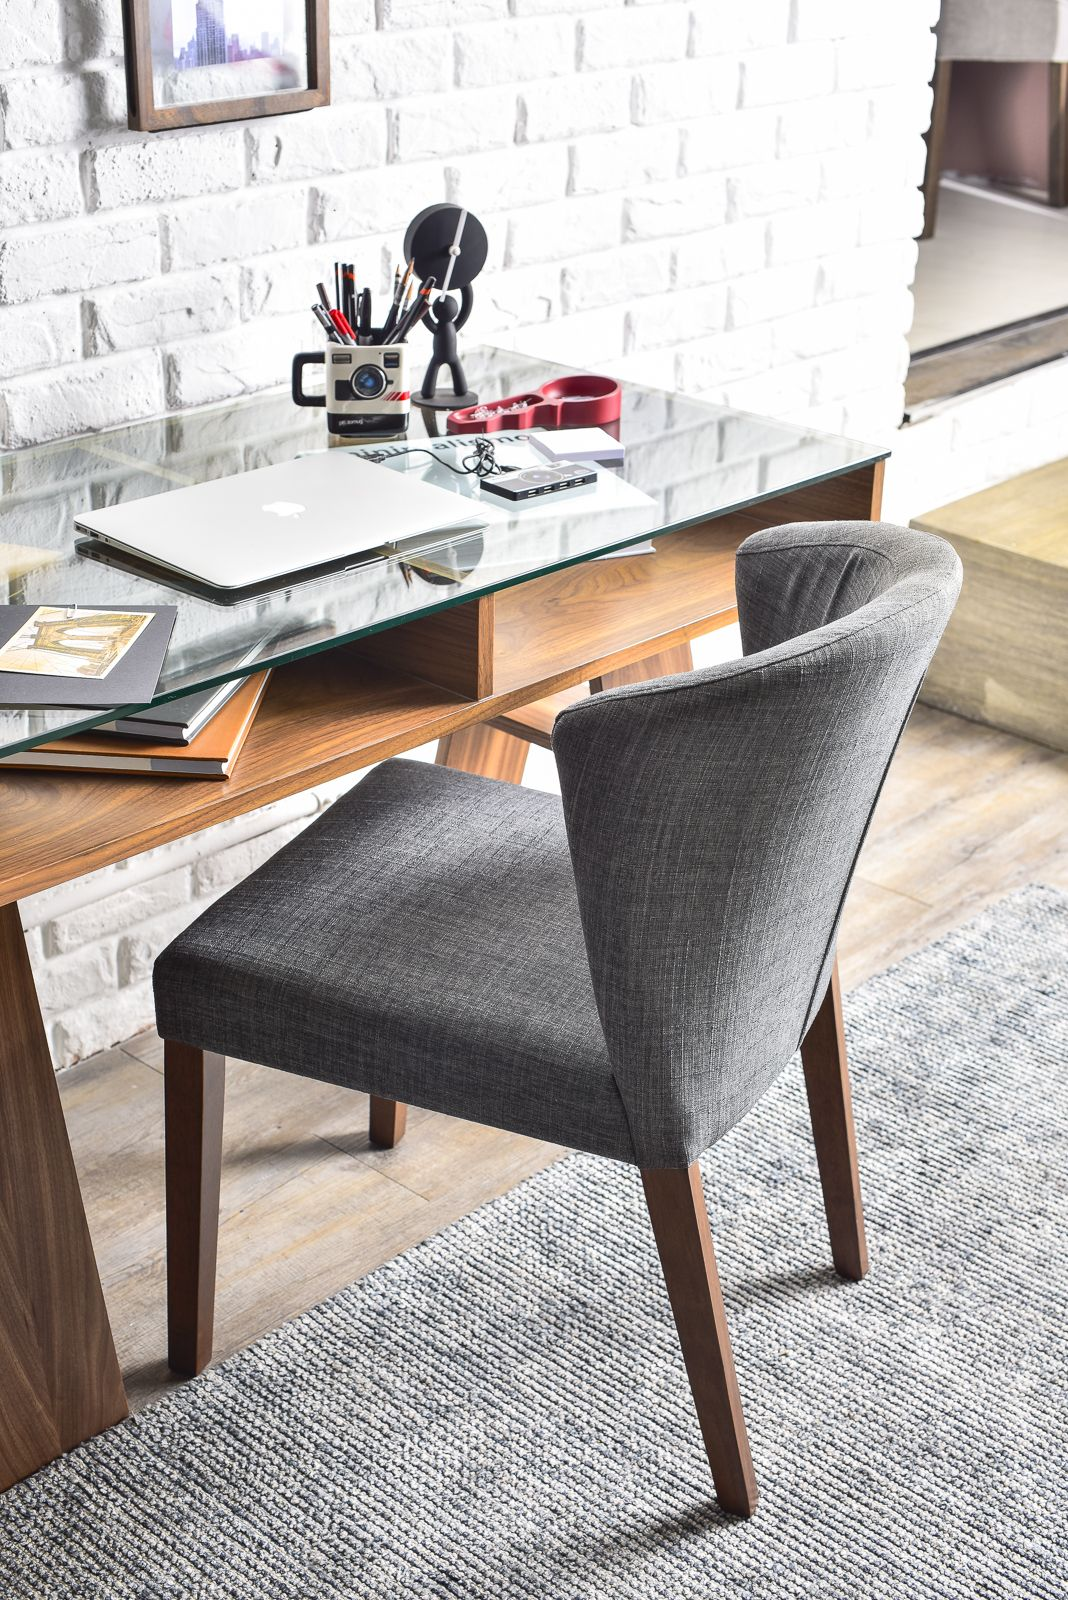 Home Office A Tu Estilo Consigue Tus Muebles Para Home Office En  # Muebles Tuestilo